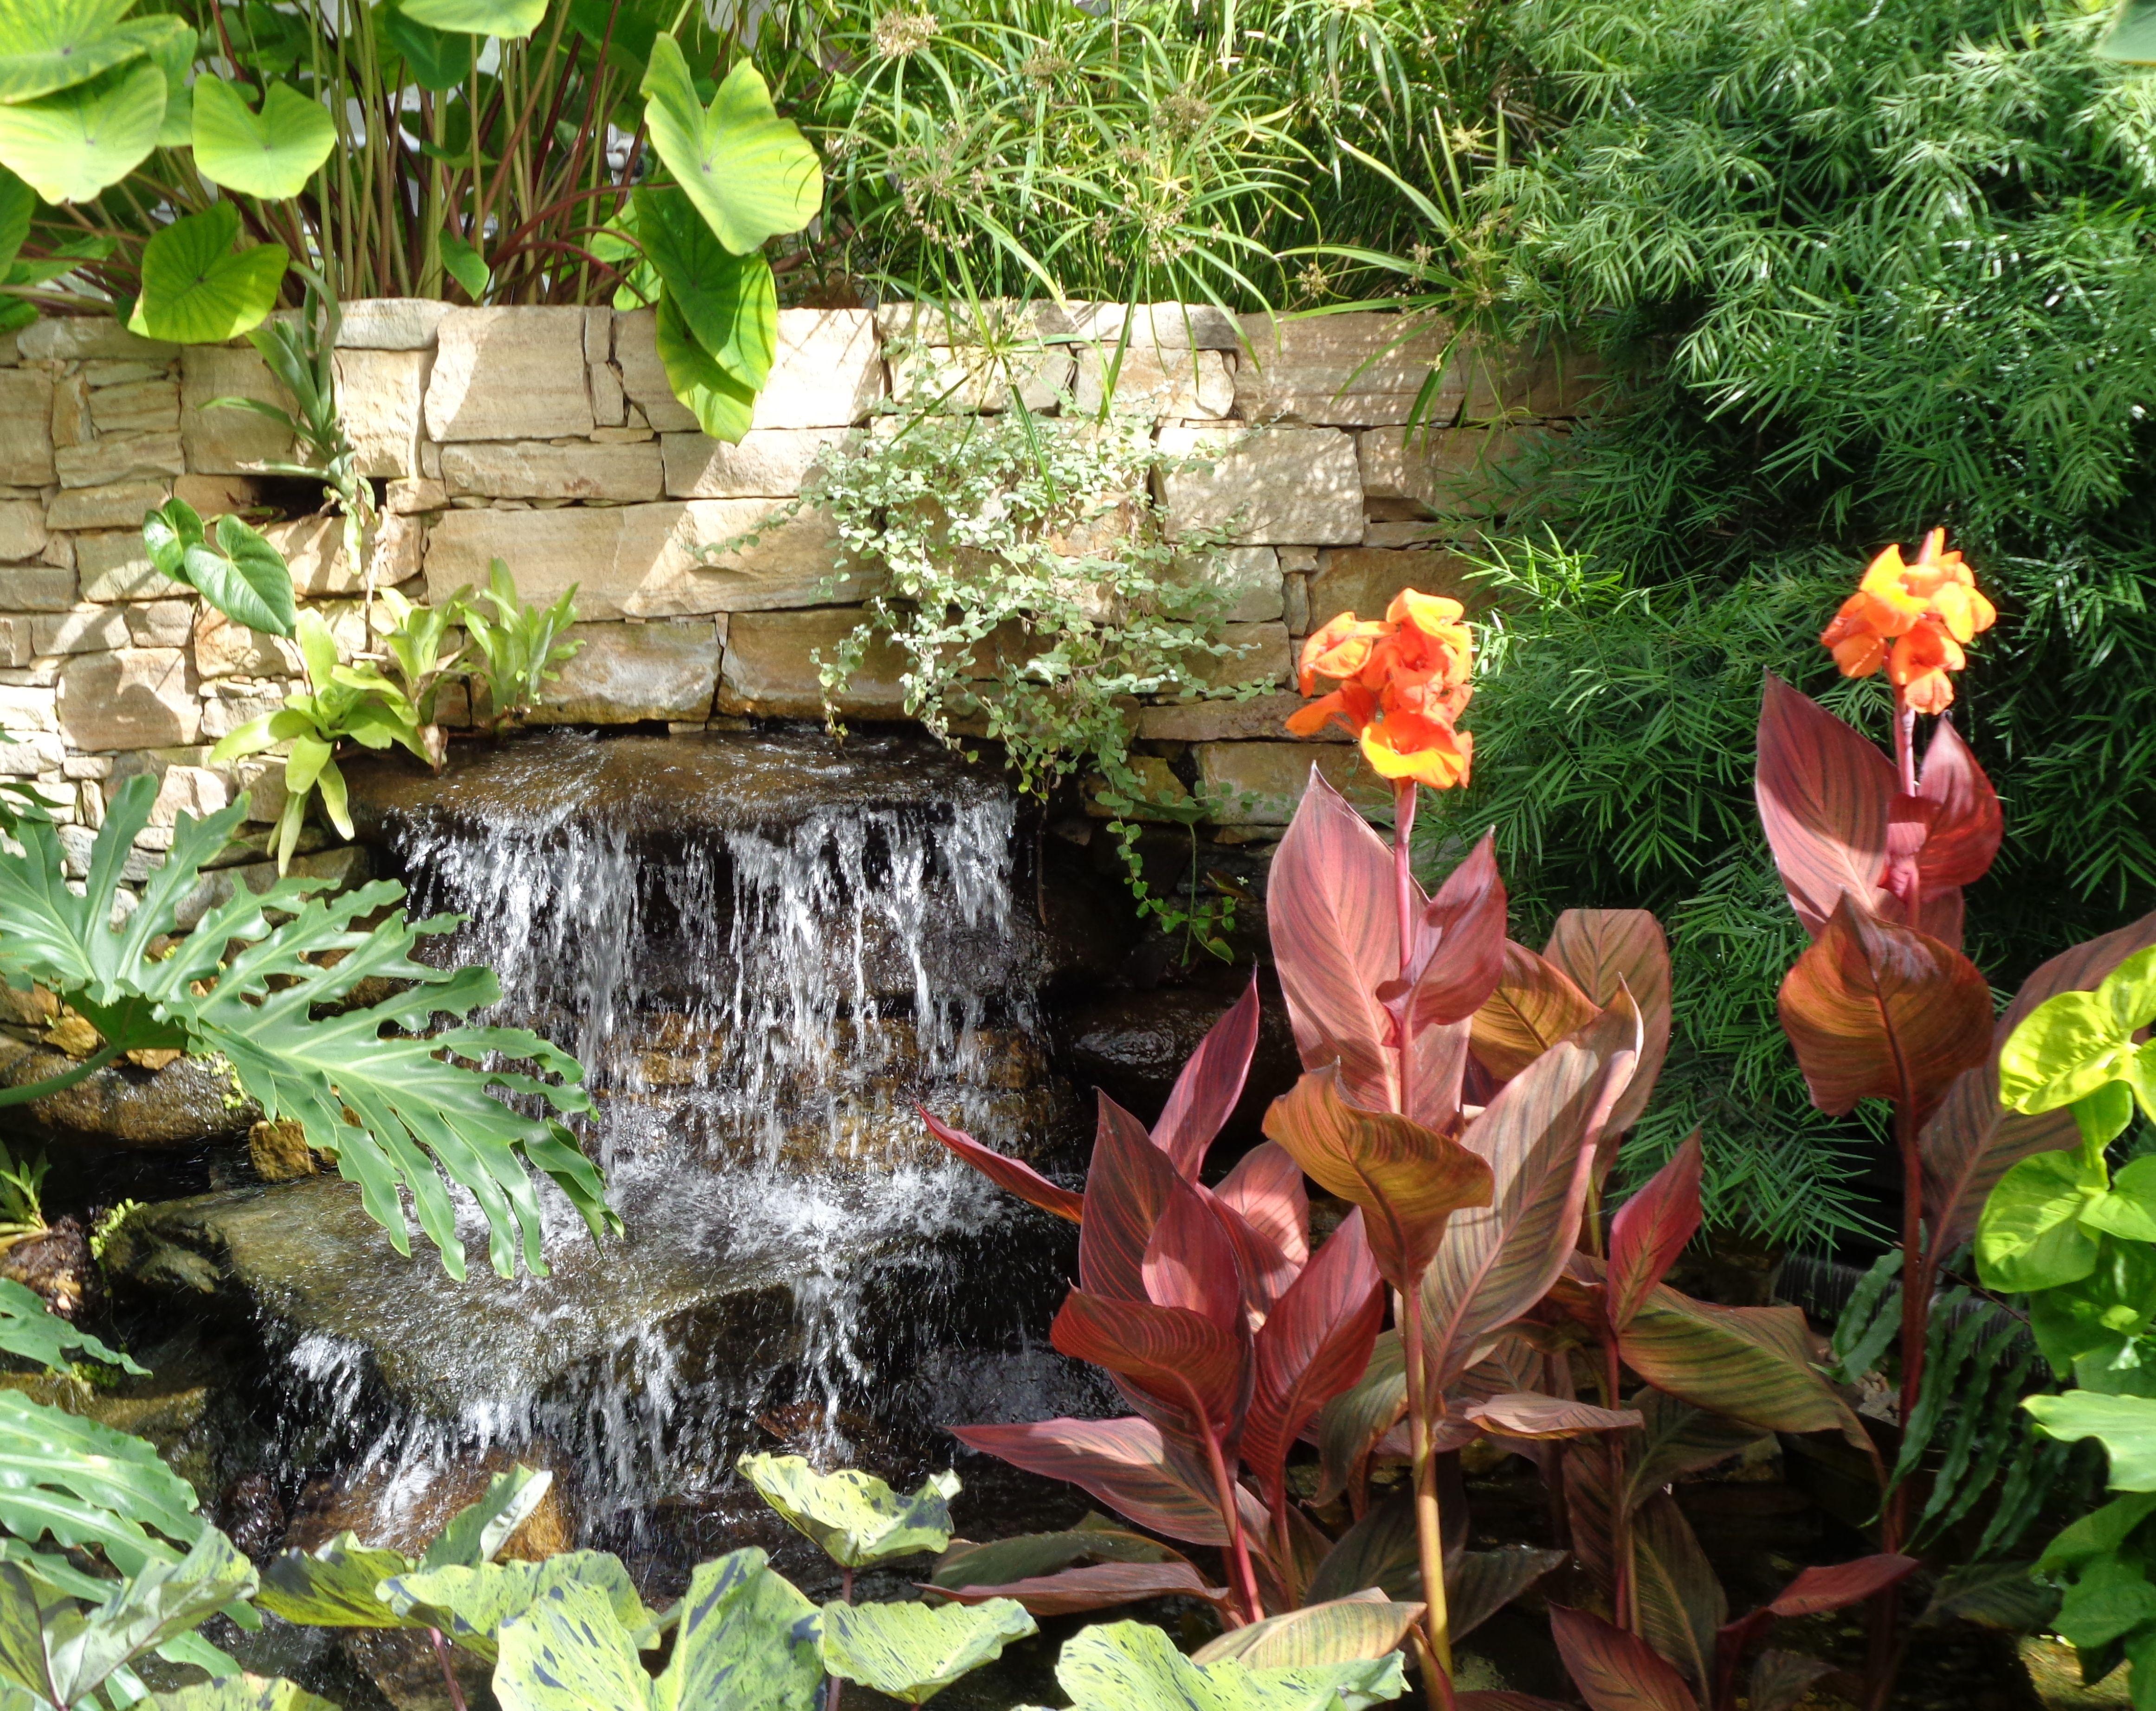 f5c744175b67e9a1ca1f1a5f312bd149 - Brookside Gardens Conservatory Wheaton Md 20902